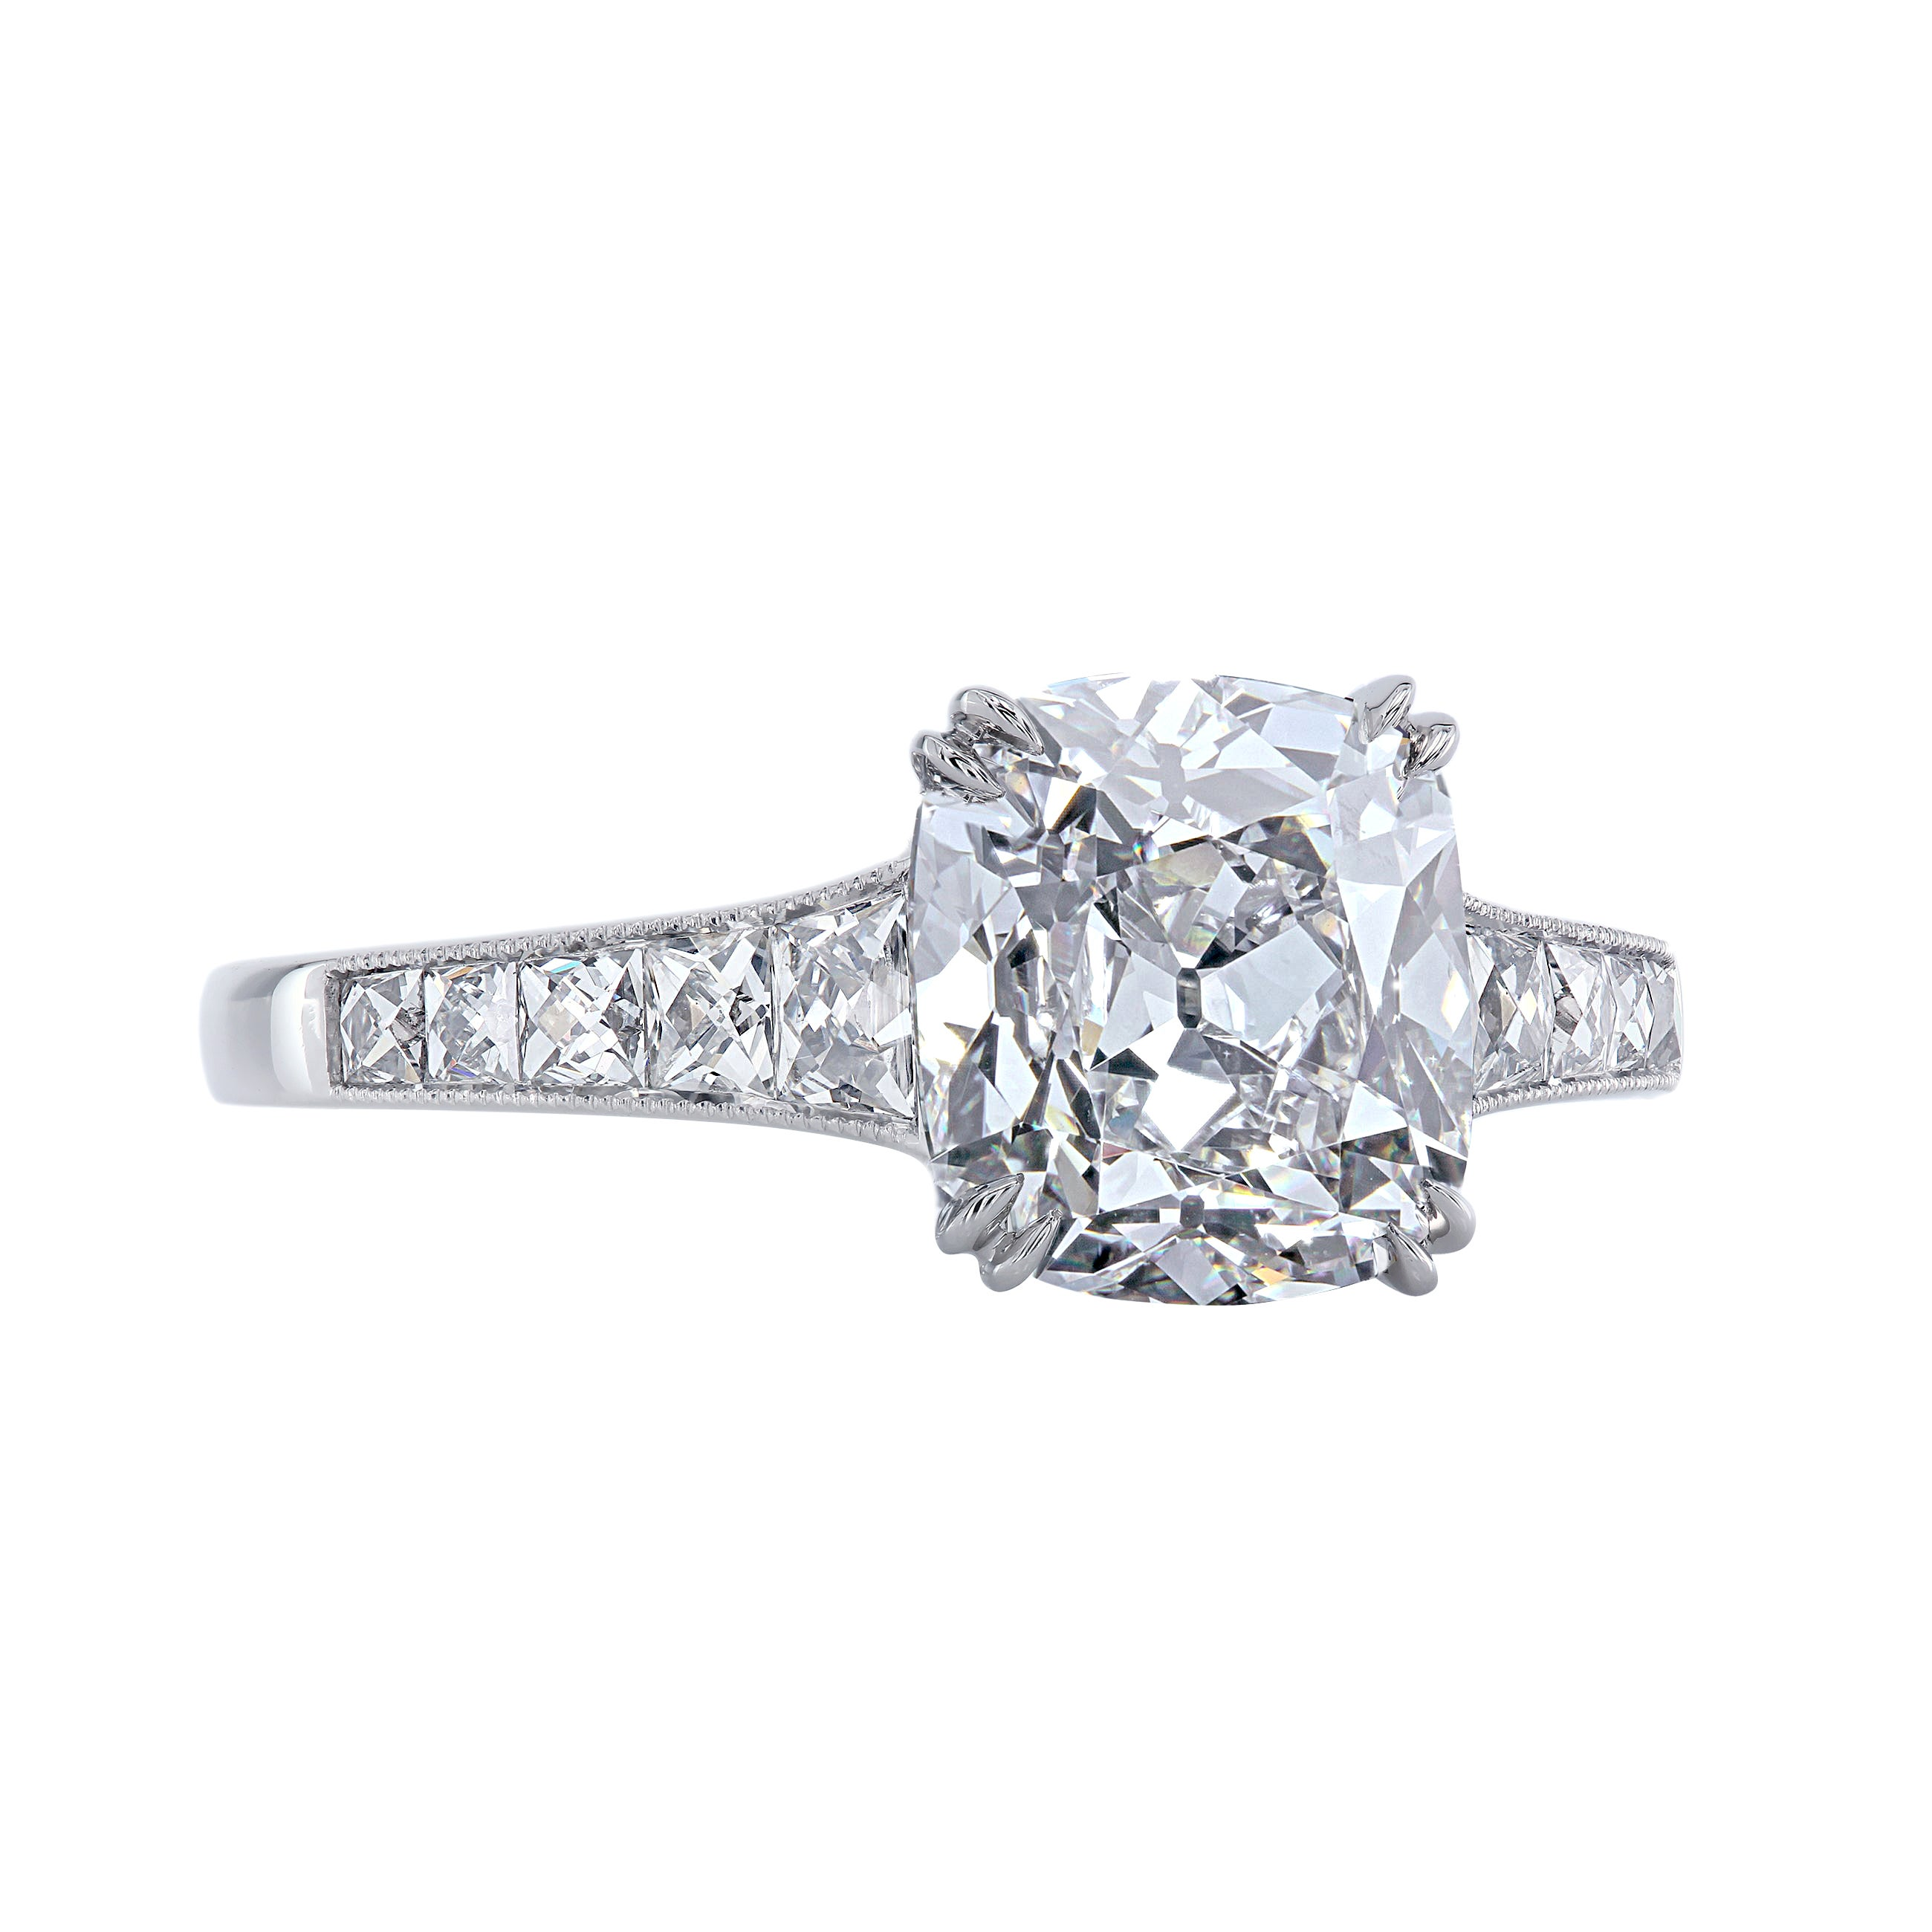 Leon Mege 6 Carat Cushion Diamond Bespoke Engagement Solitaire Platinum Ring